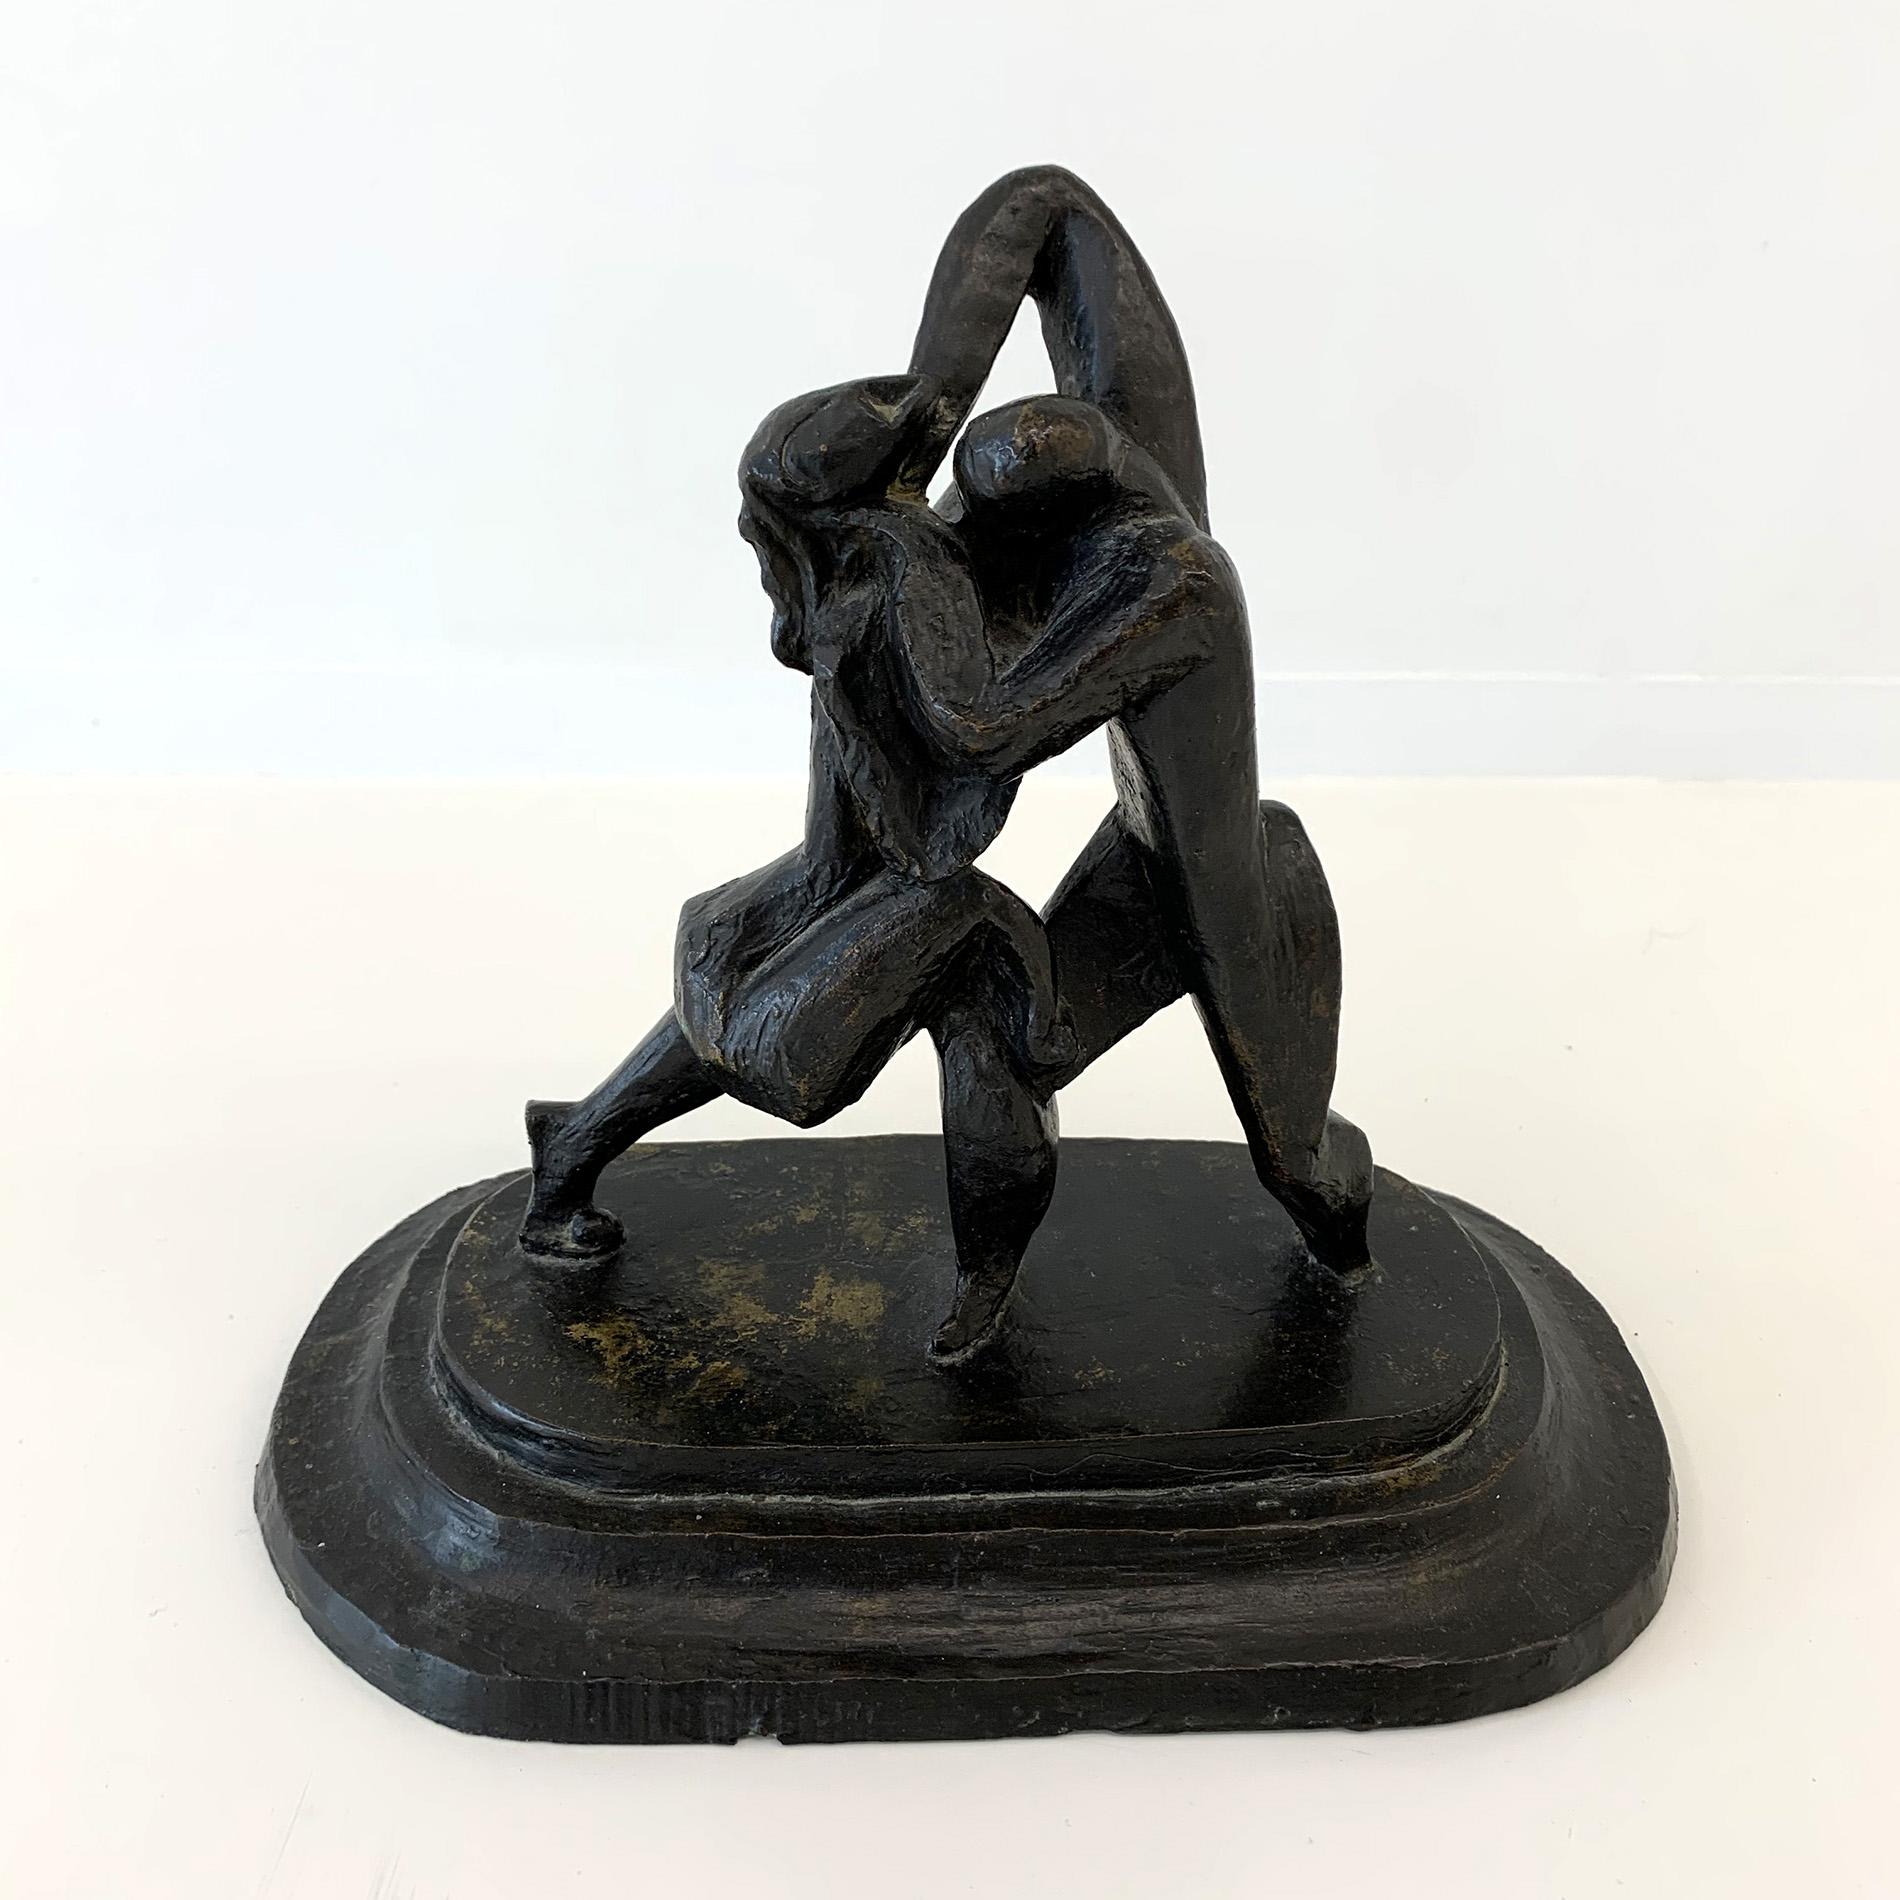 Philip Aguirre Y Otegui | Untitled (fighting pair) 1992